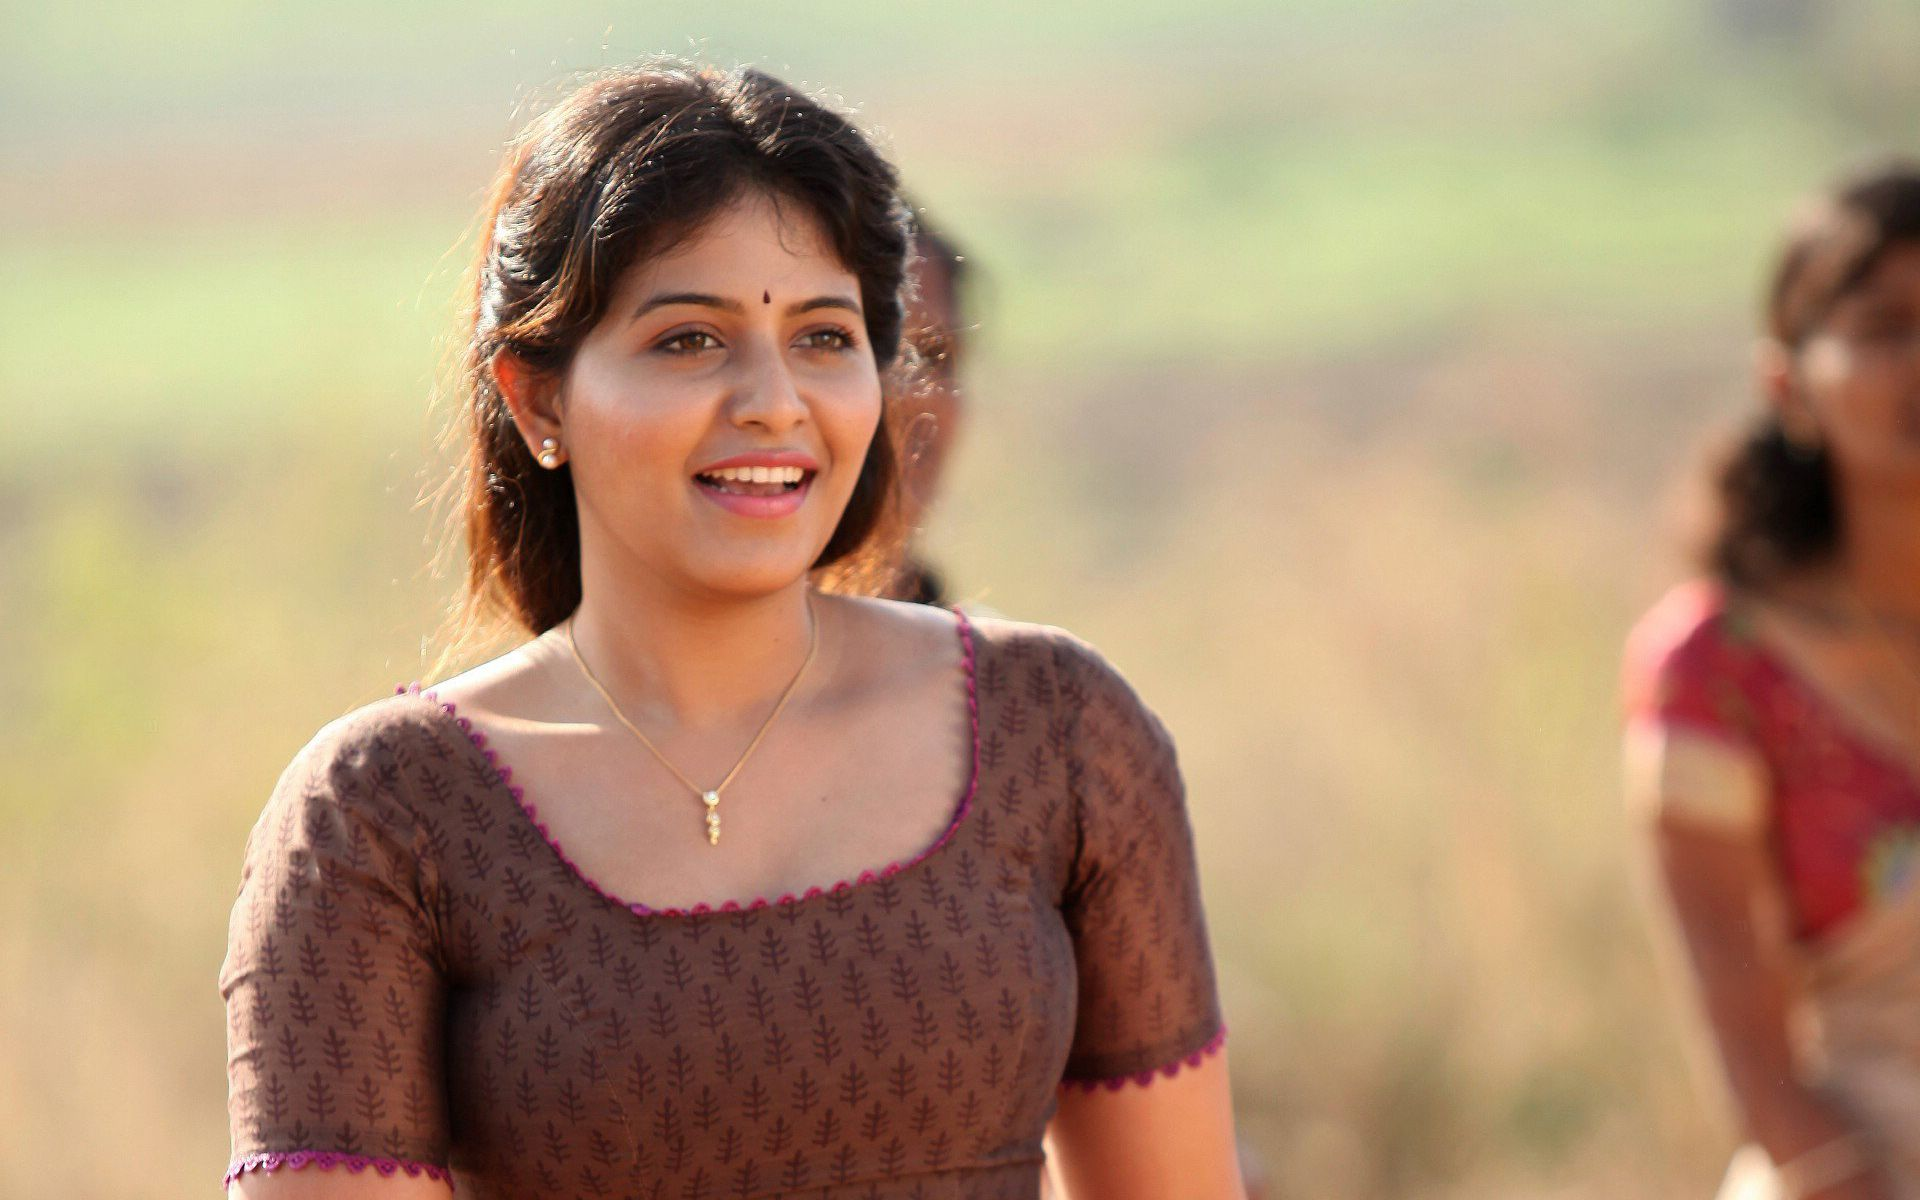 anjali next movie anjali new movie stills anjali new movie